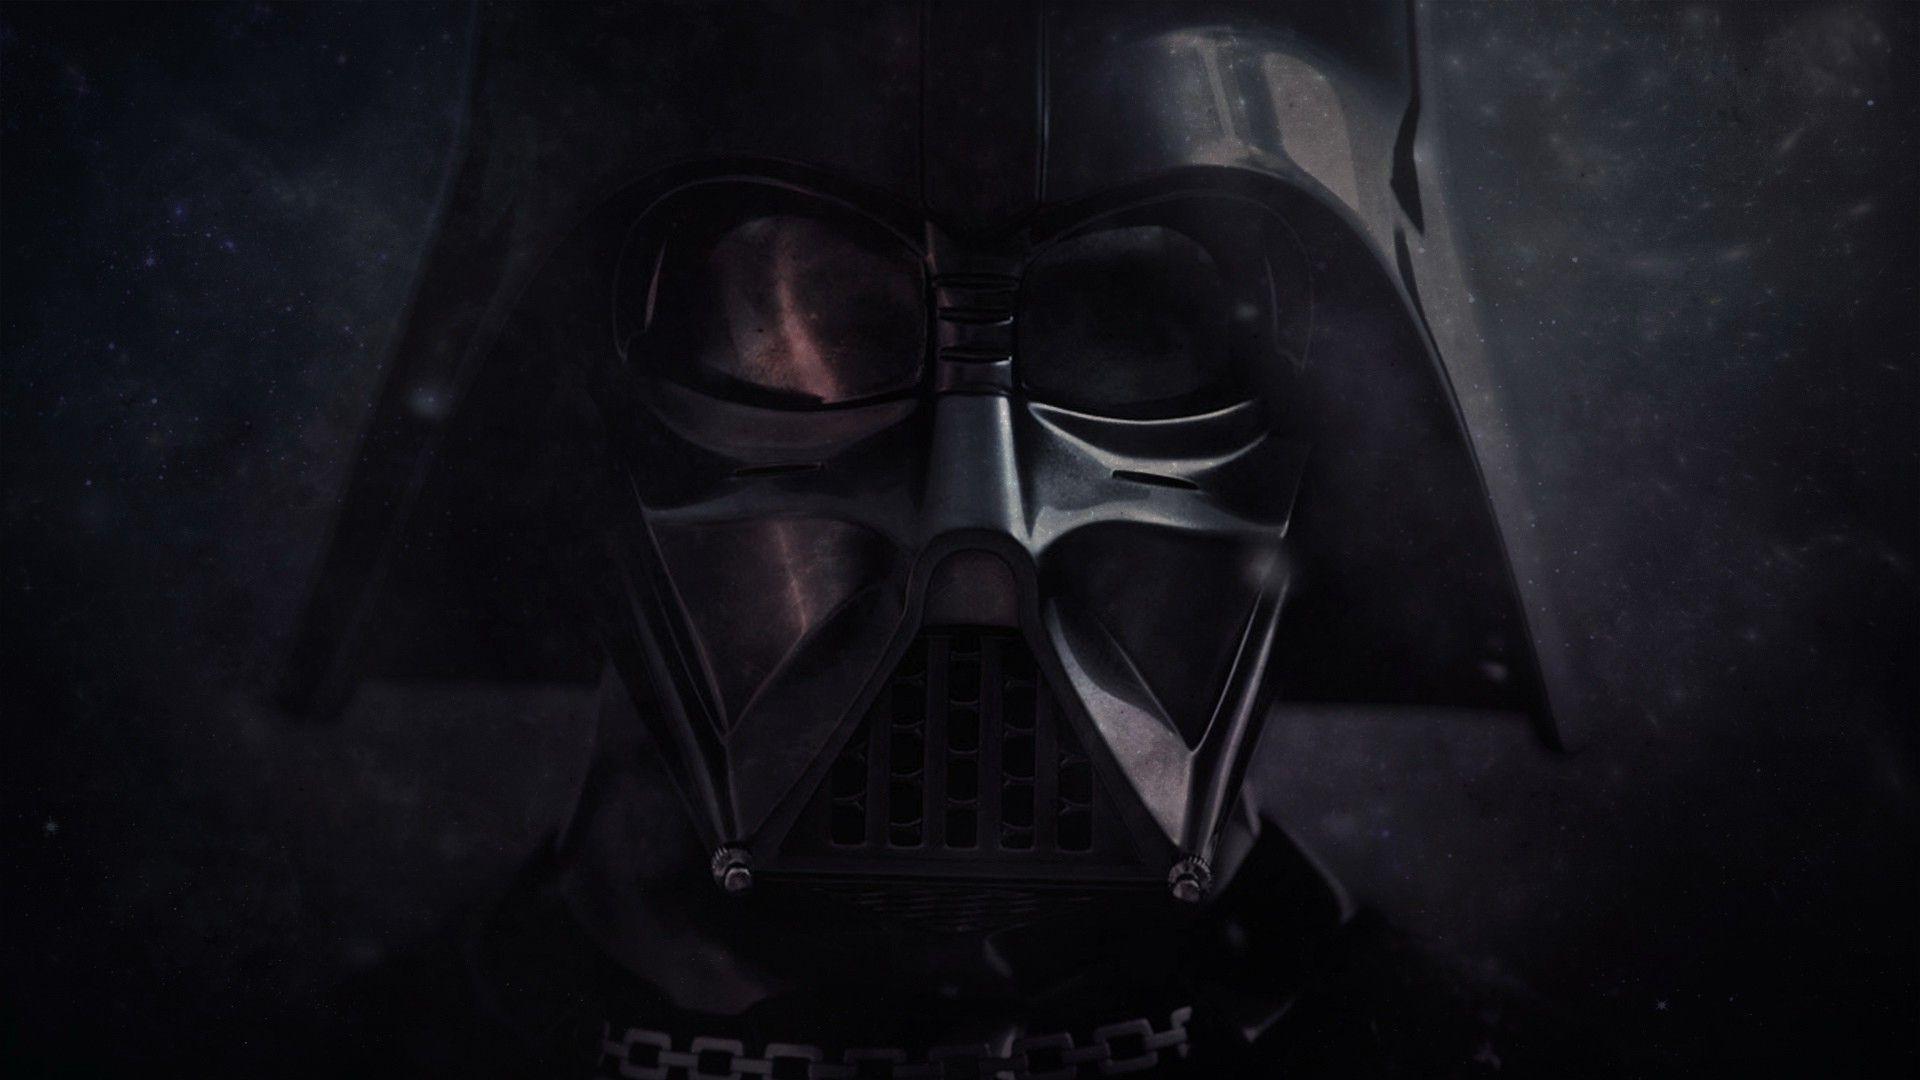 Wallpaper Star Wars Artwork Movies Darth Vader